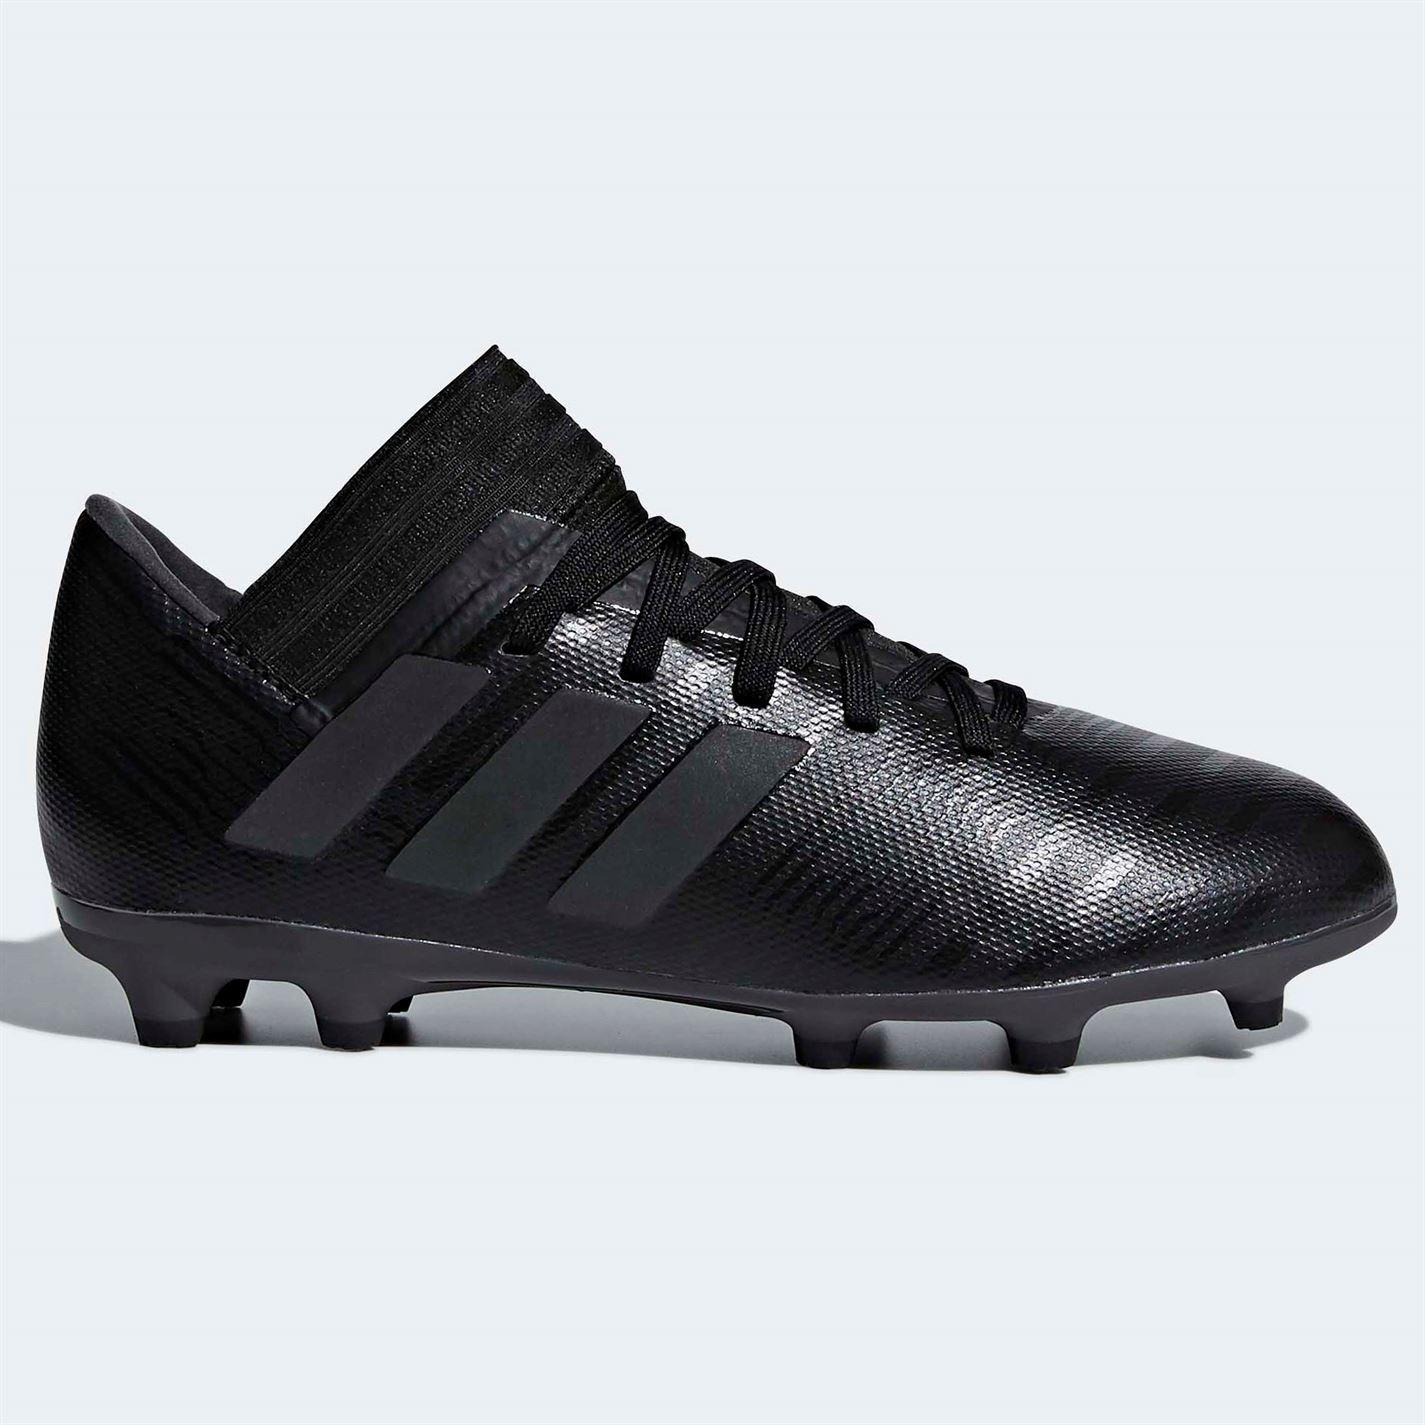 9bc2222ddee Details about adidas Nemeziz 17.3 Firm Ground FG Football Boots Childs  Black Soccer Cleats